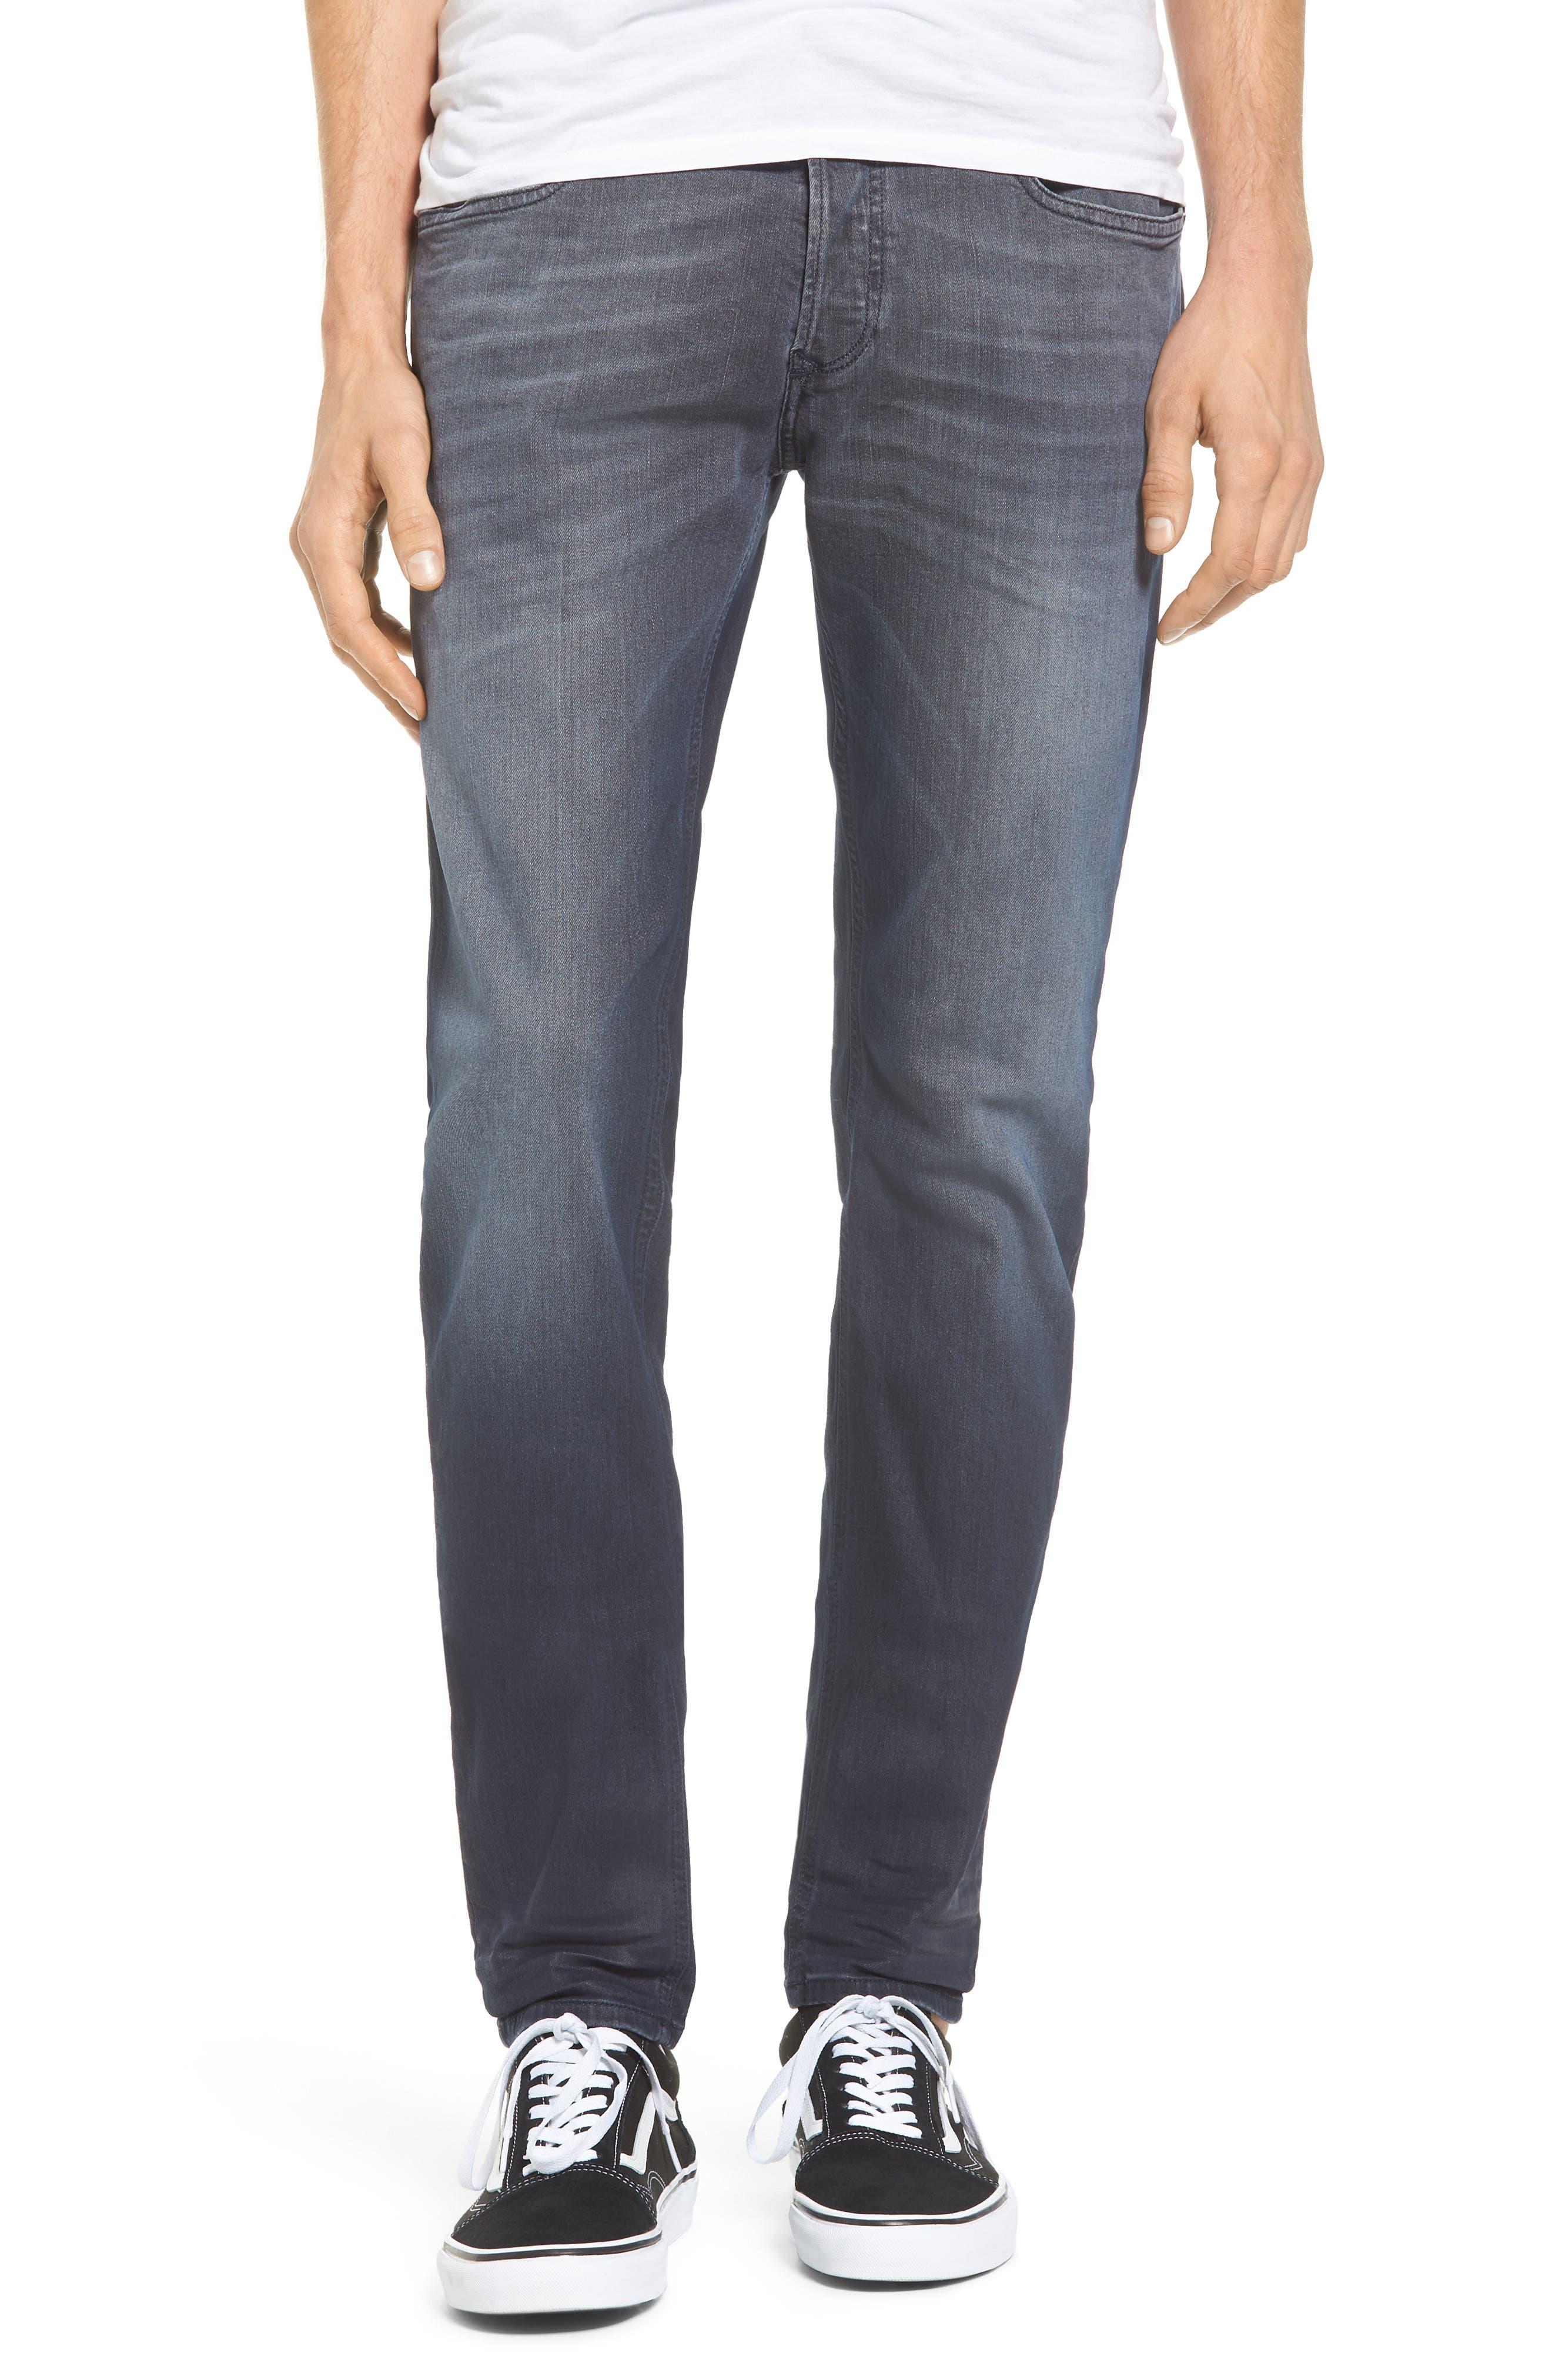 Sleenker Skinny Fit Jeans,                         Main,                         color, Denim